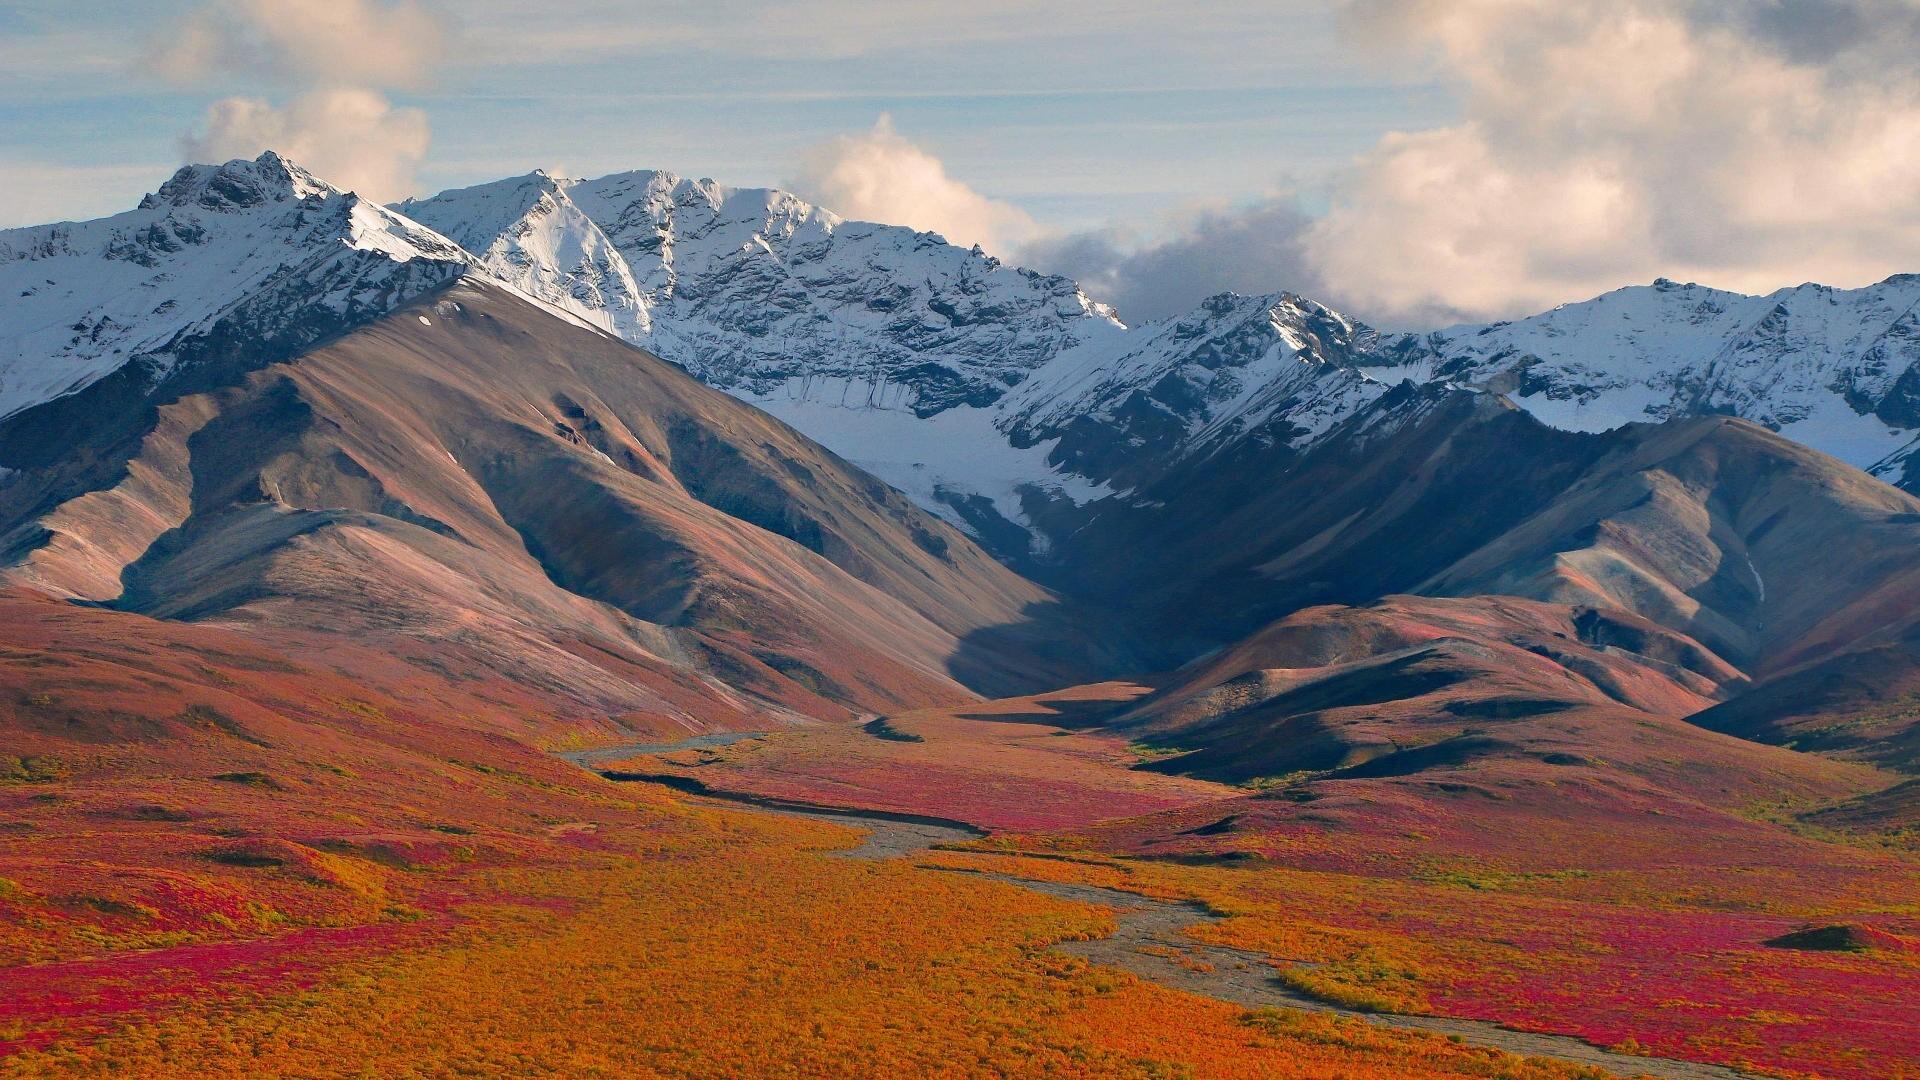 Denali National Park Mountain View In Alaska United States Wallpaper